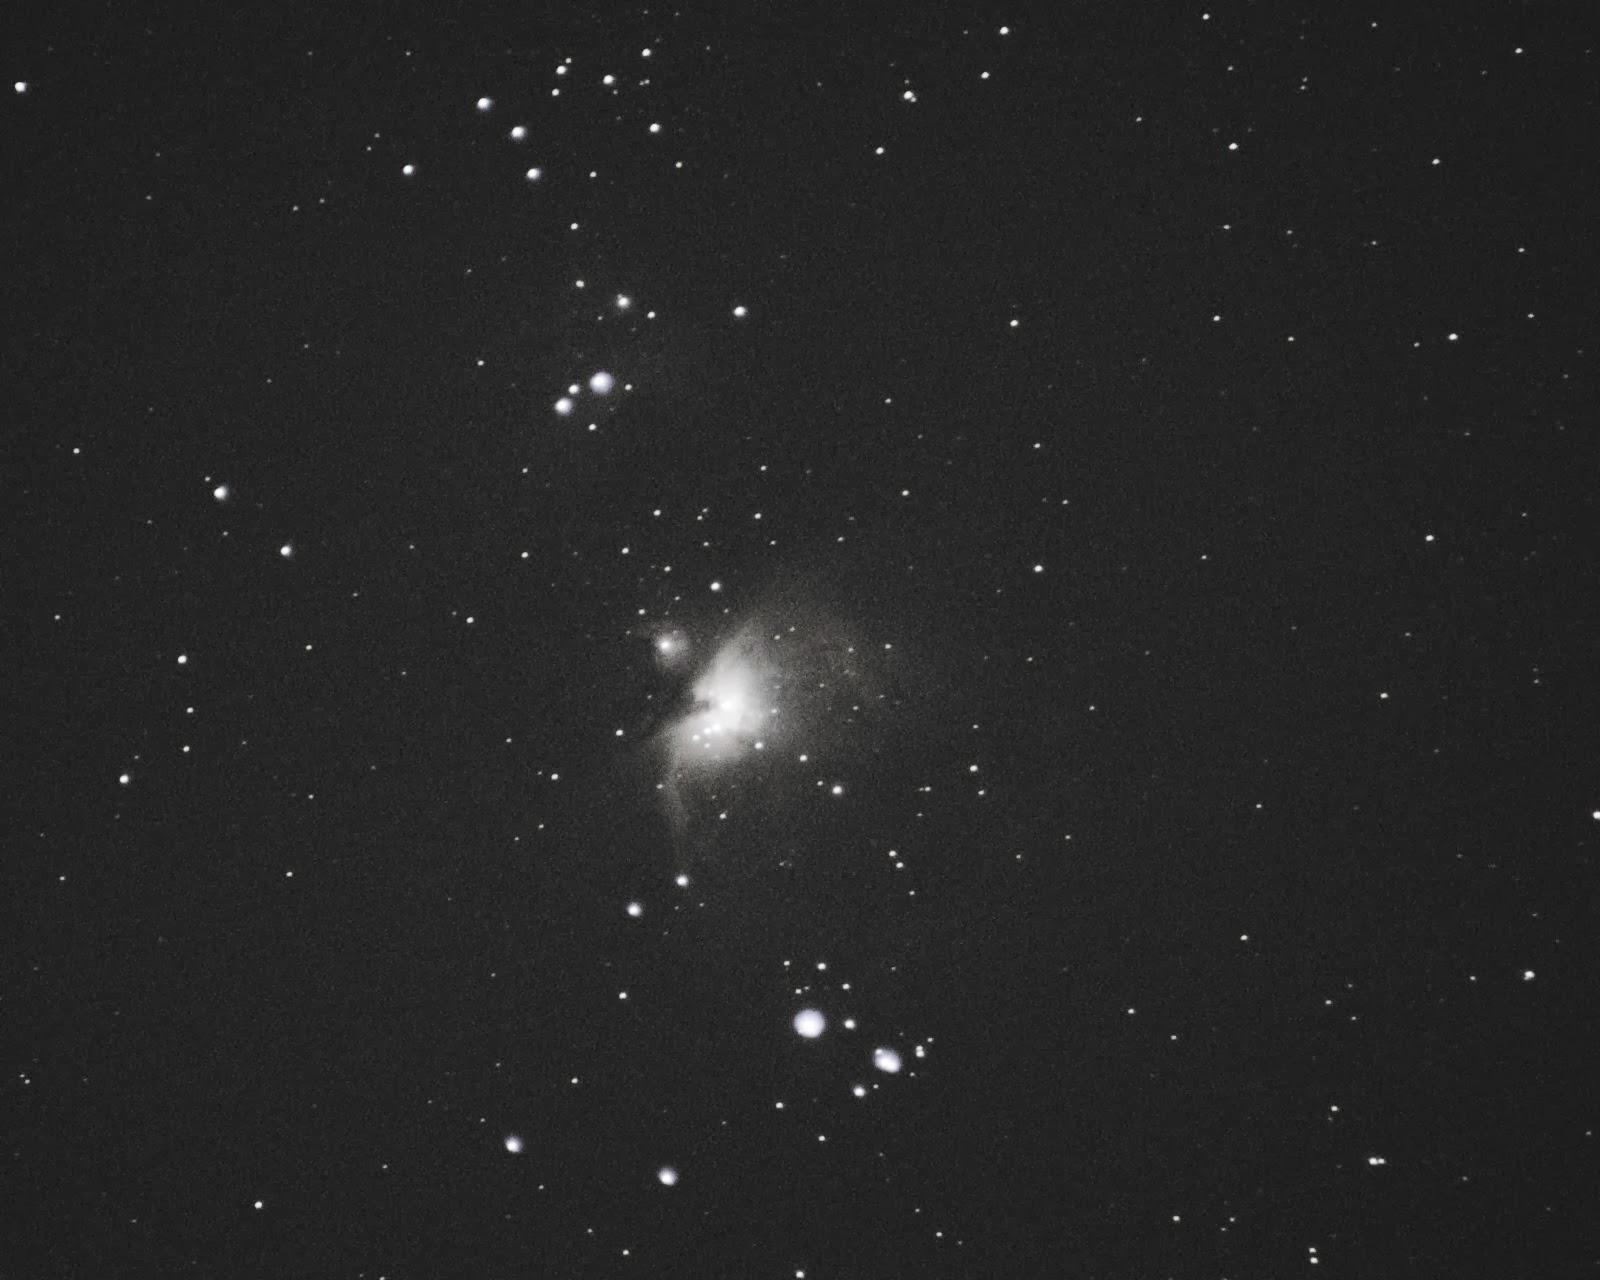 from small telescope orion nebula - photo #4